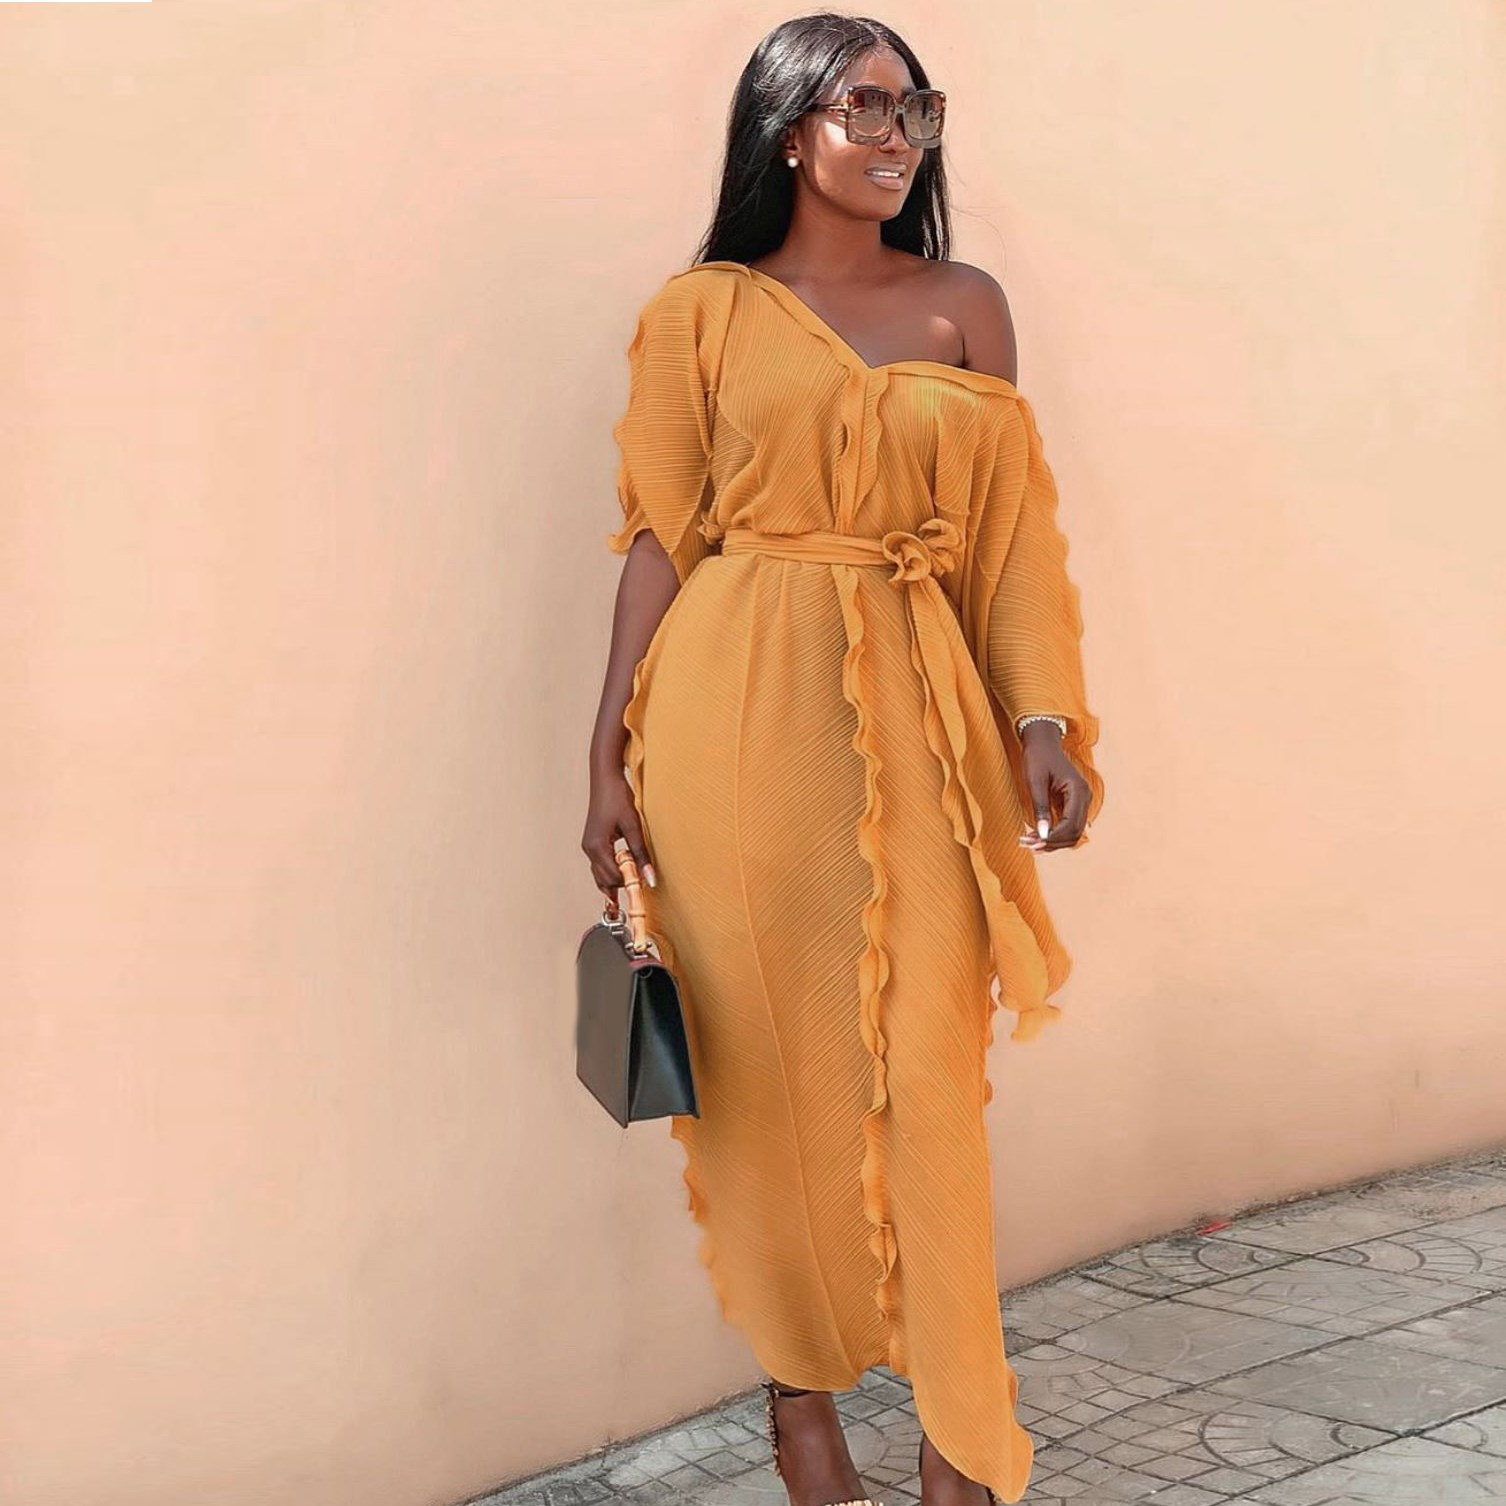 Loose Women Half Sleeve Ruffles Long Dress Casual Boho Style Party Beach Maxi Dress Fashion V Neck Oversized Falbala Dress 3